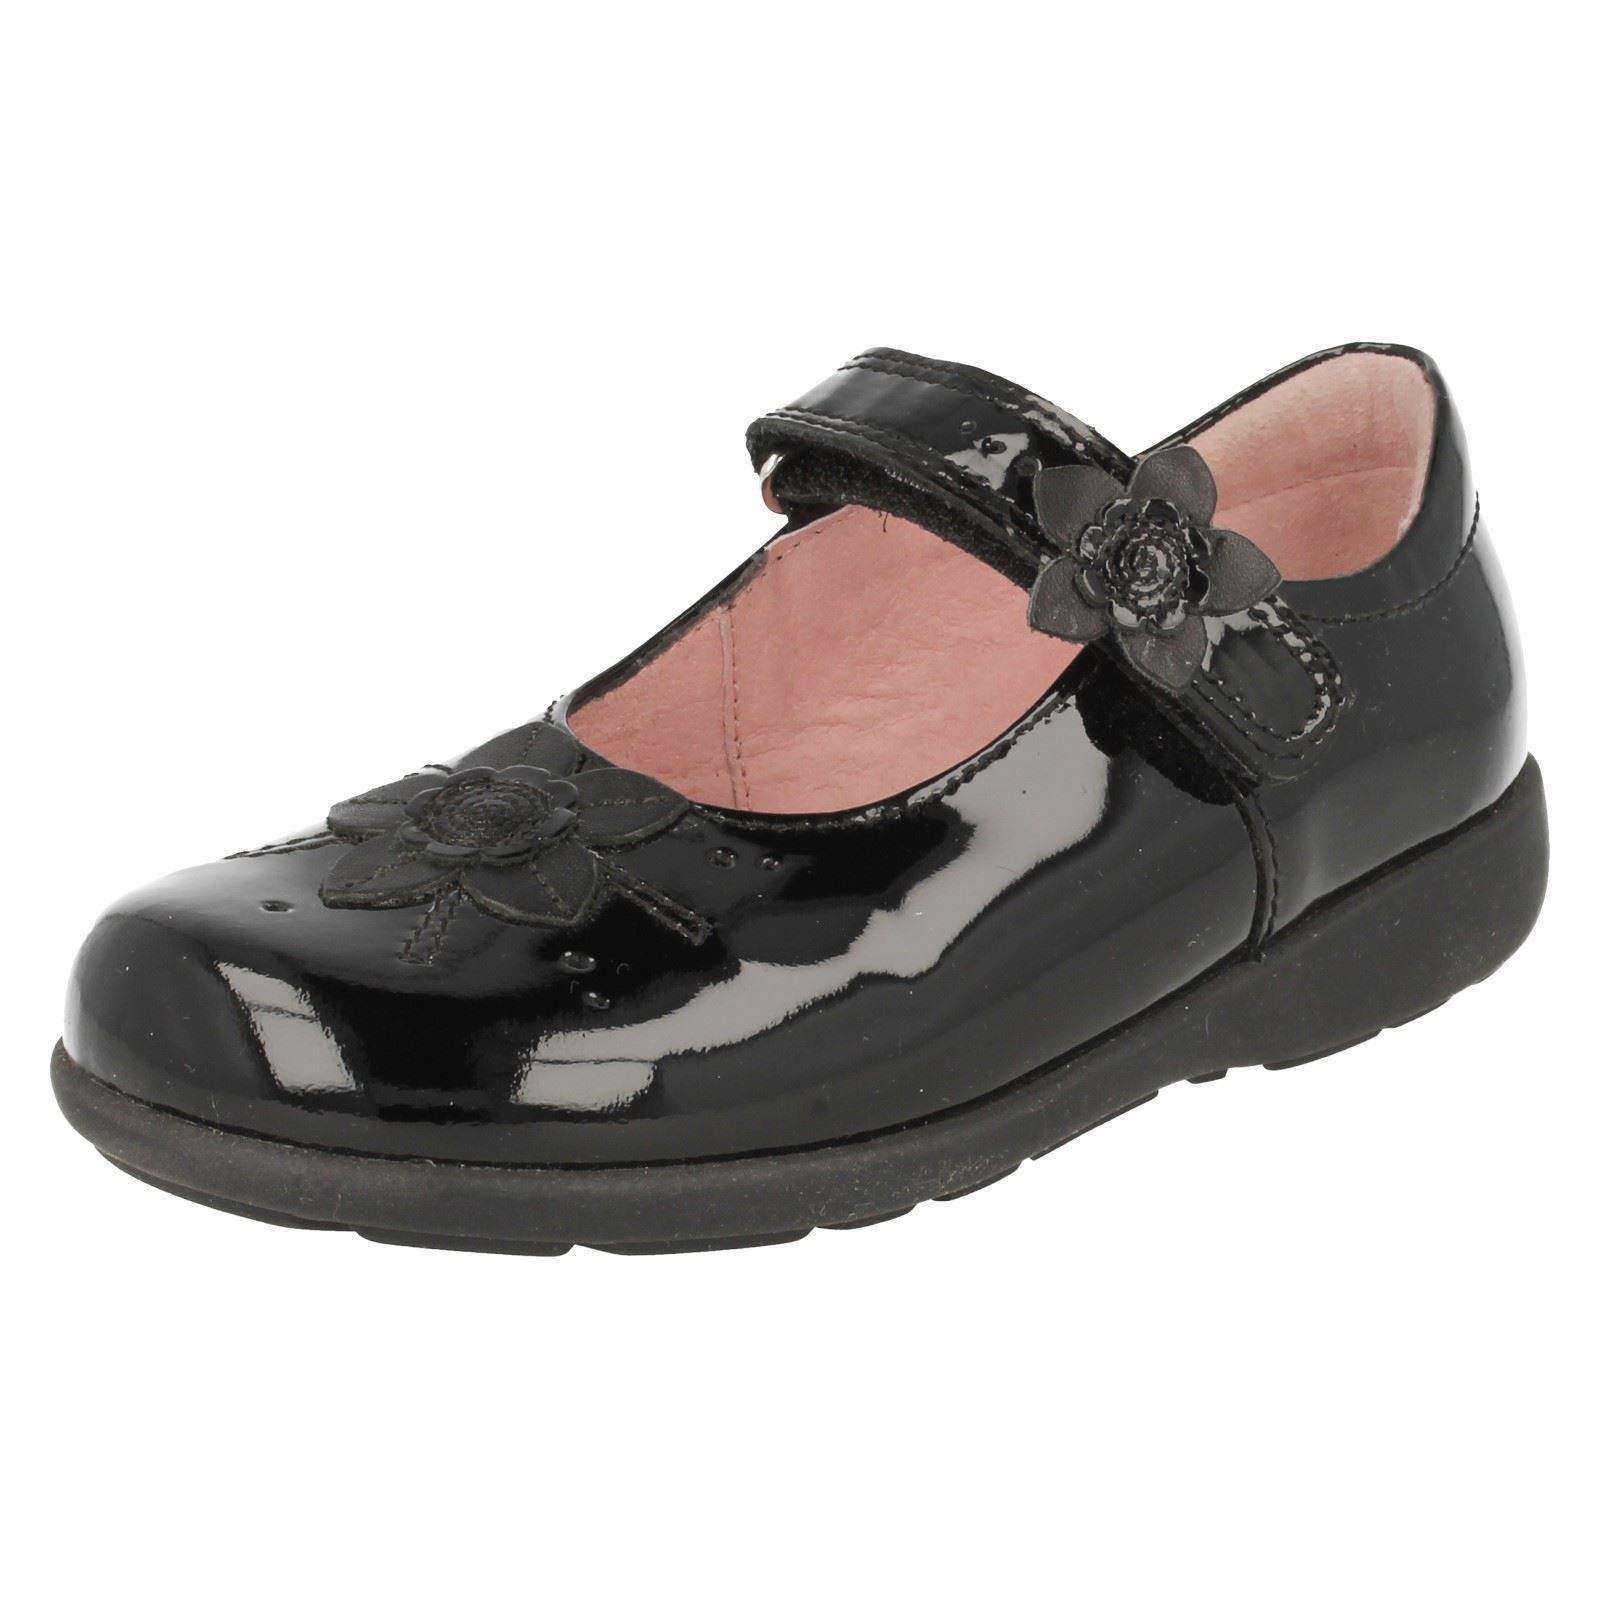 Chicas START Rite Mary Jane Zapatos Escolares, Estilo Violeta-W